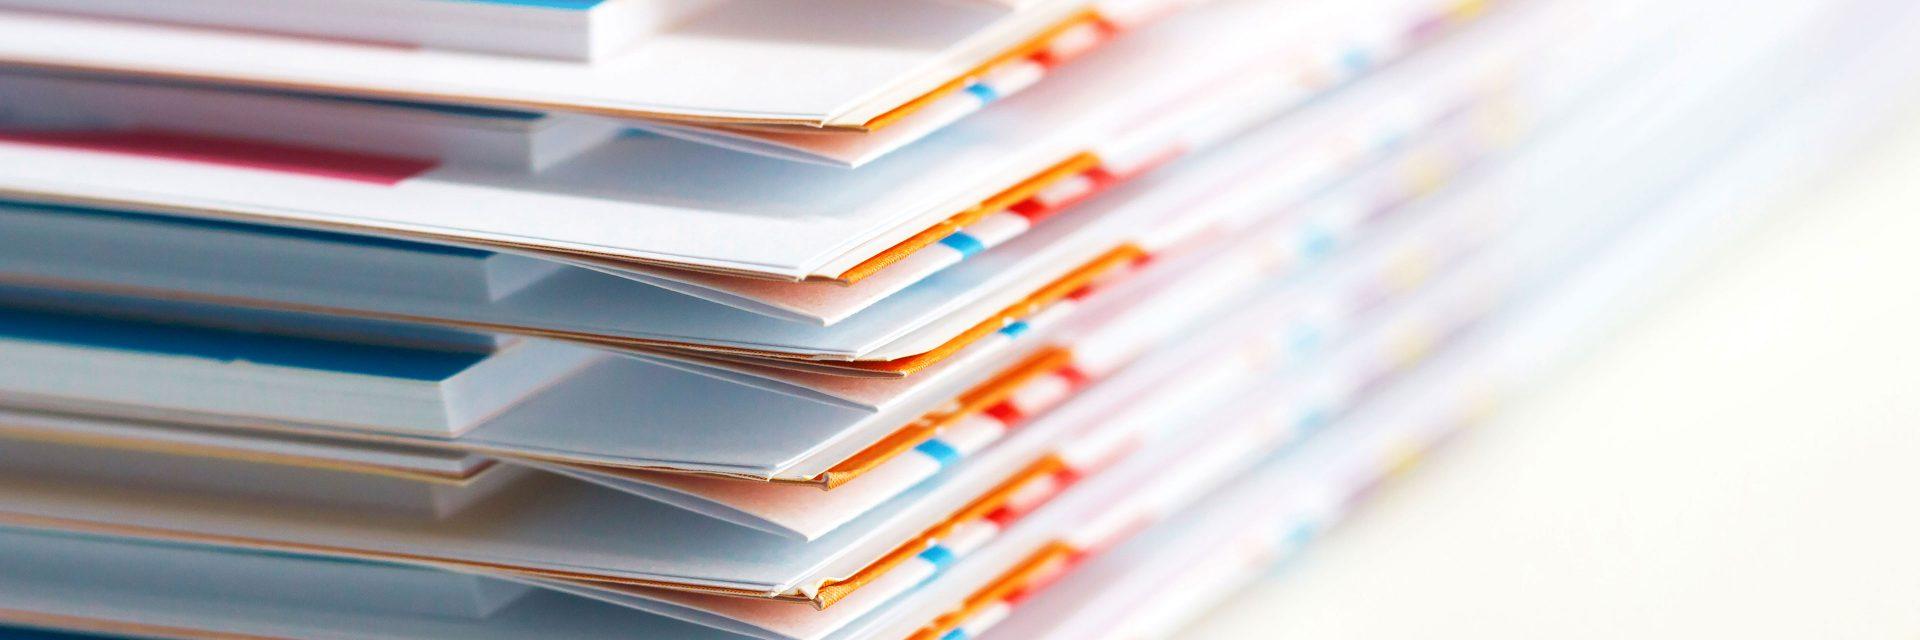 Improving Documentation Change Control Process